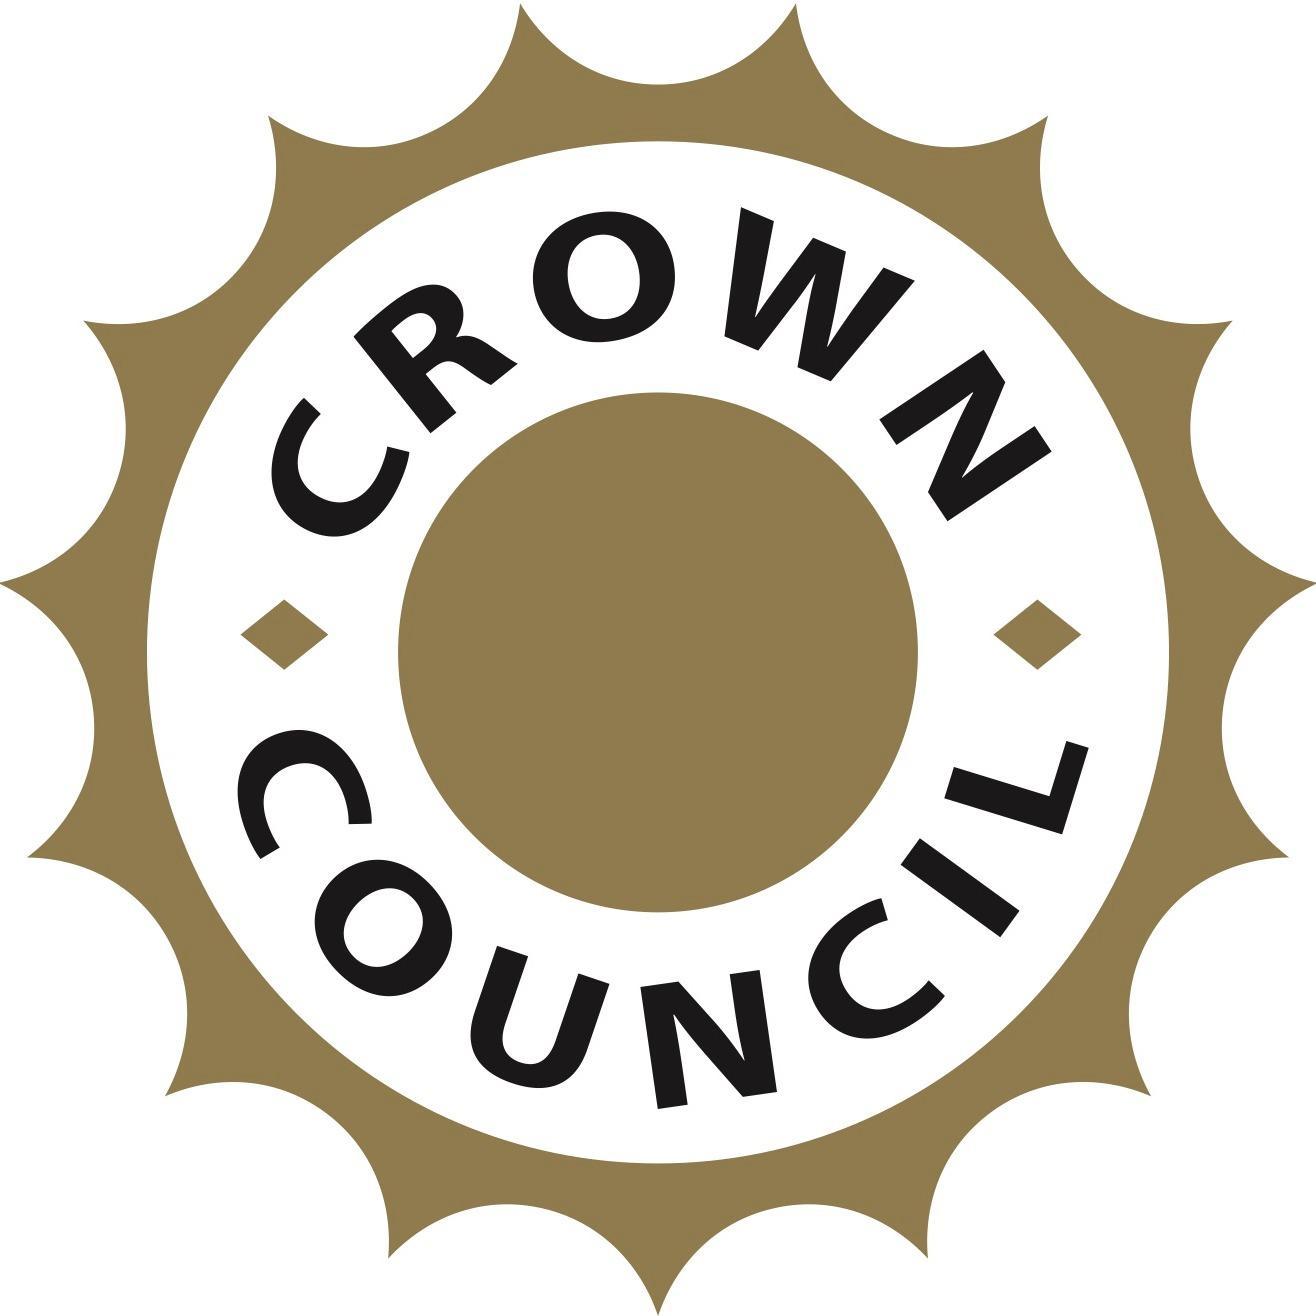 Association or Organization in UT Salt Lake City 84117 Crown Council Inc 975 Woodoak Lane Suite 200 (800)276-9658